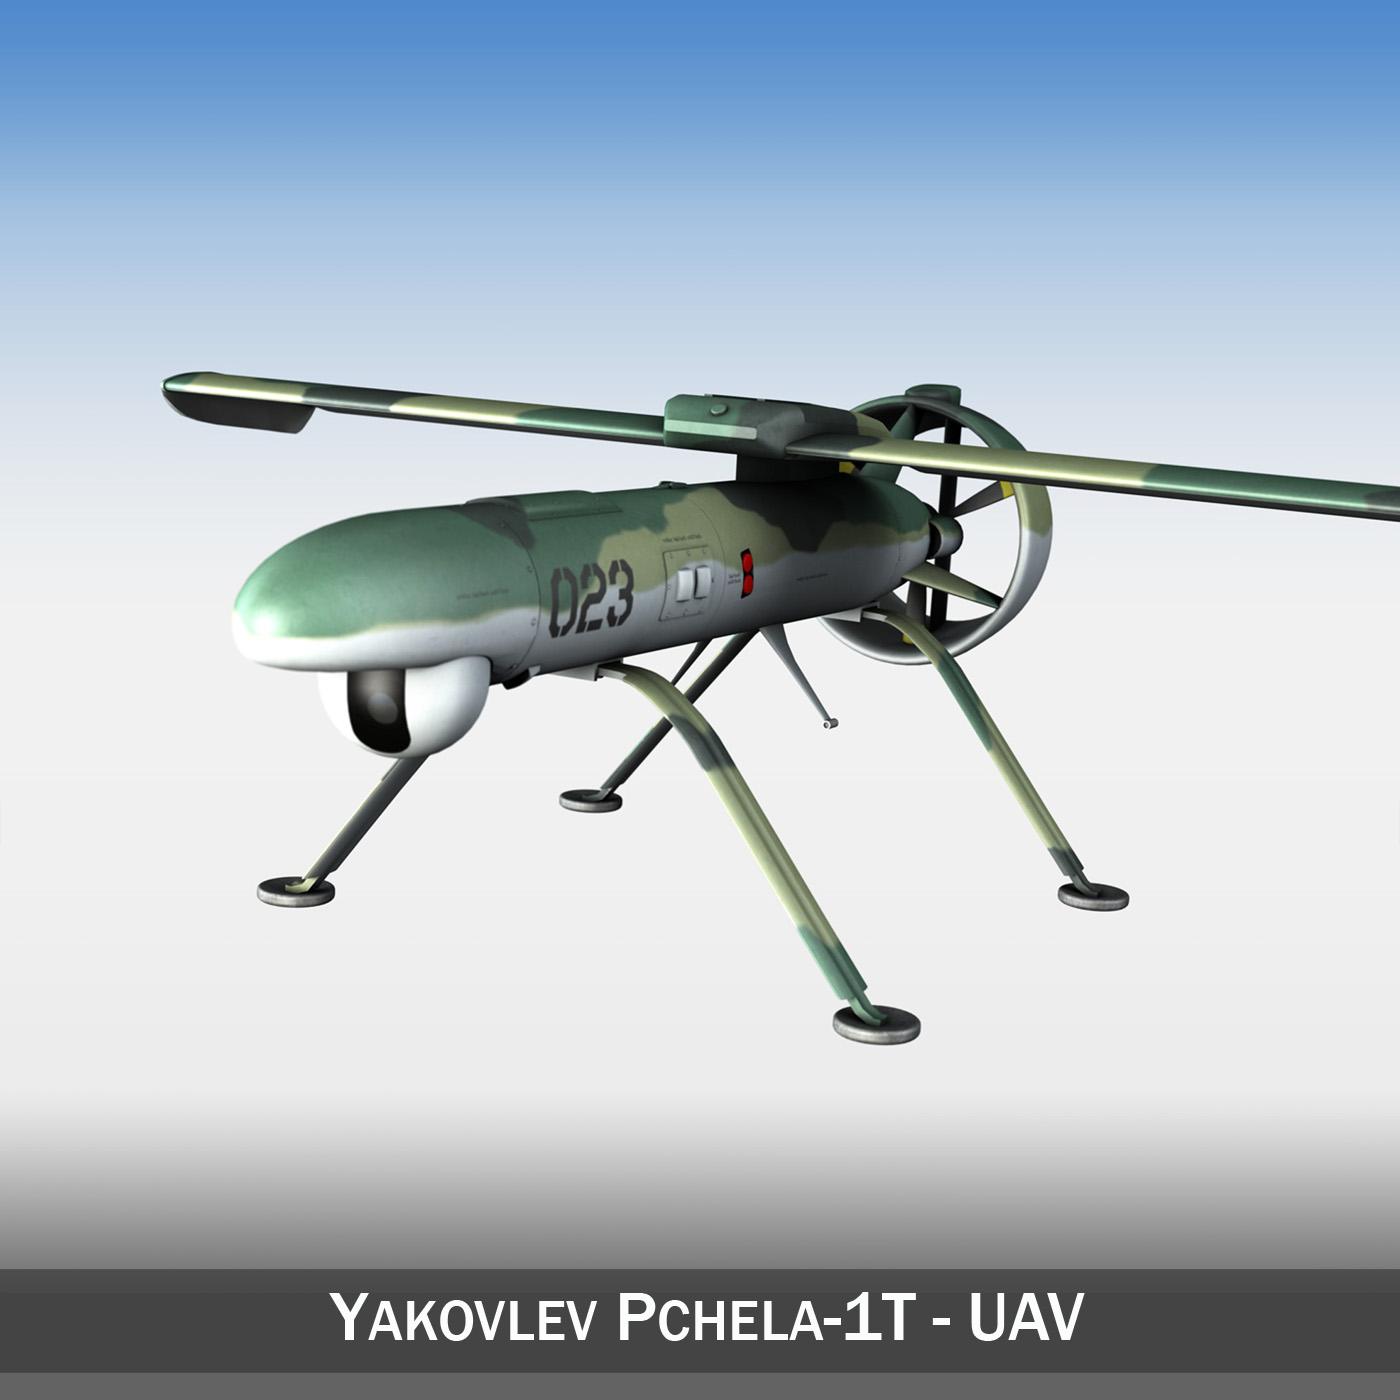 pchela 1t drone russian uav 3d model 3ds fbx c4d lwo obj 188460